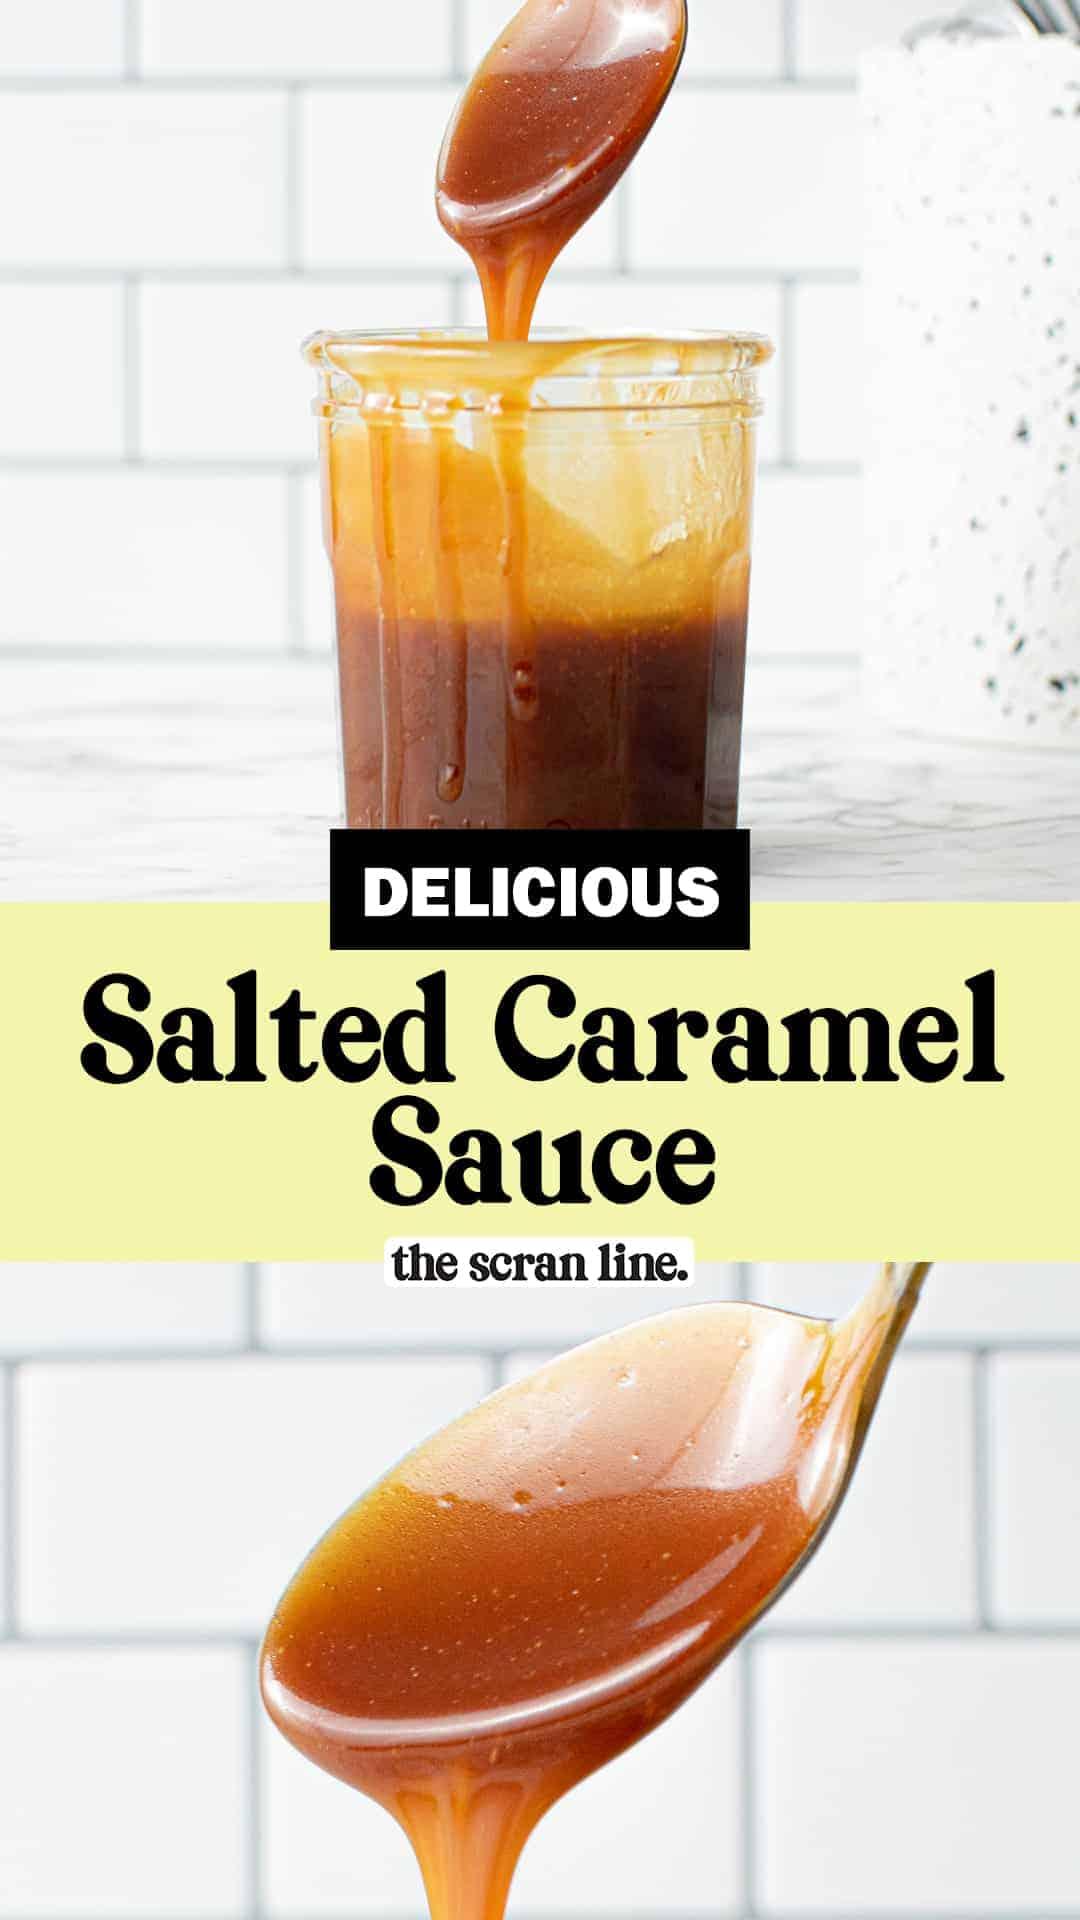 Pinterest image for Salted Caramel Sauce